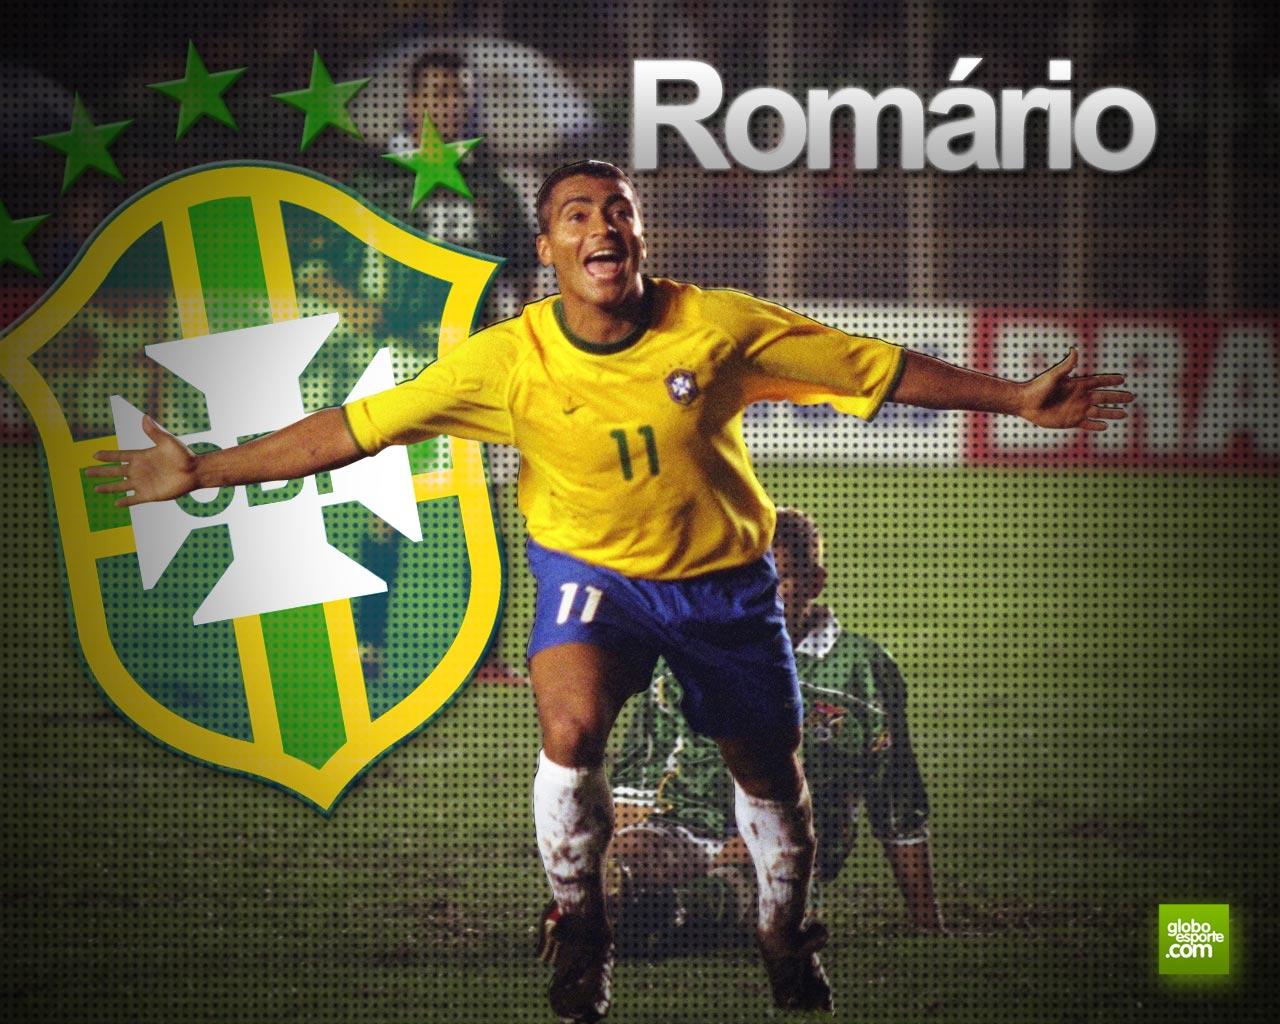 Romrio  Stars in Sports